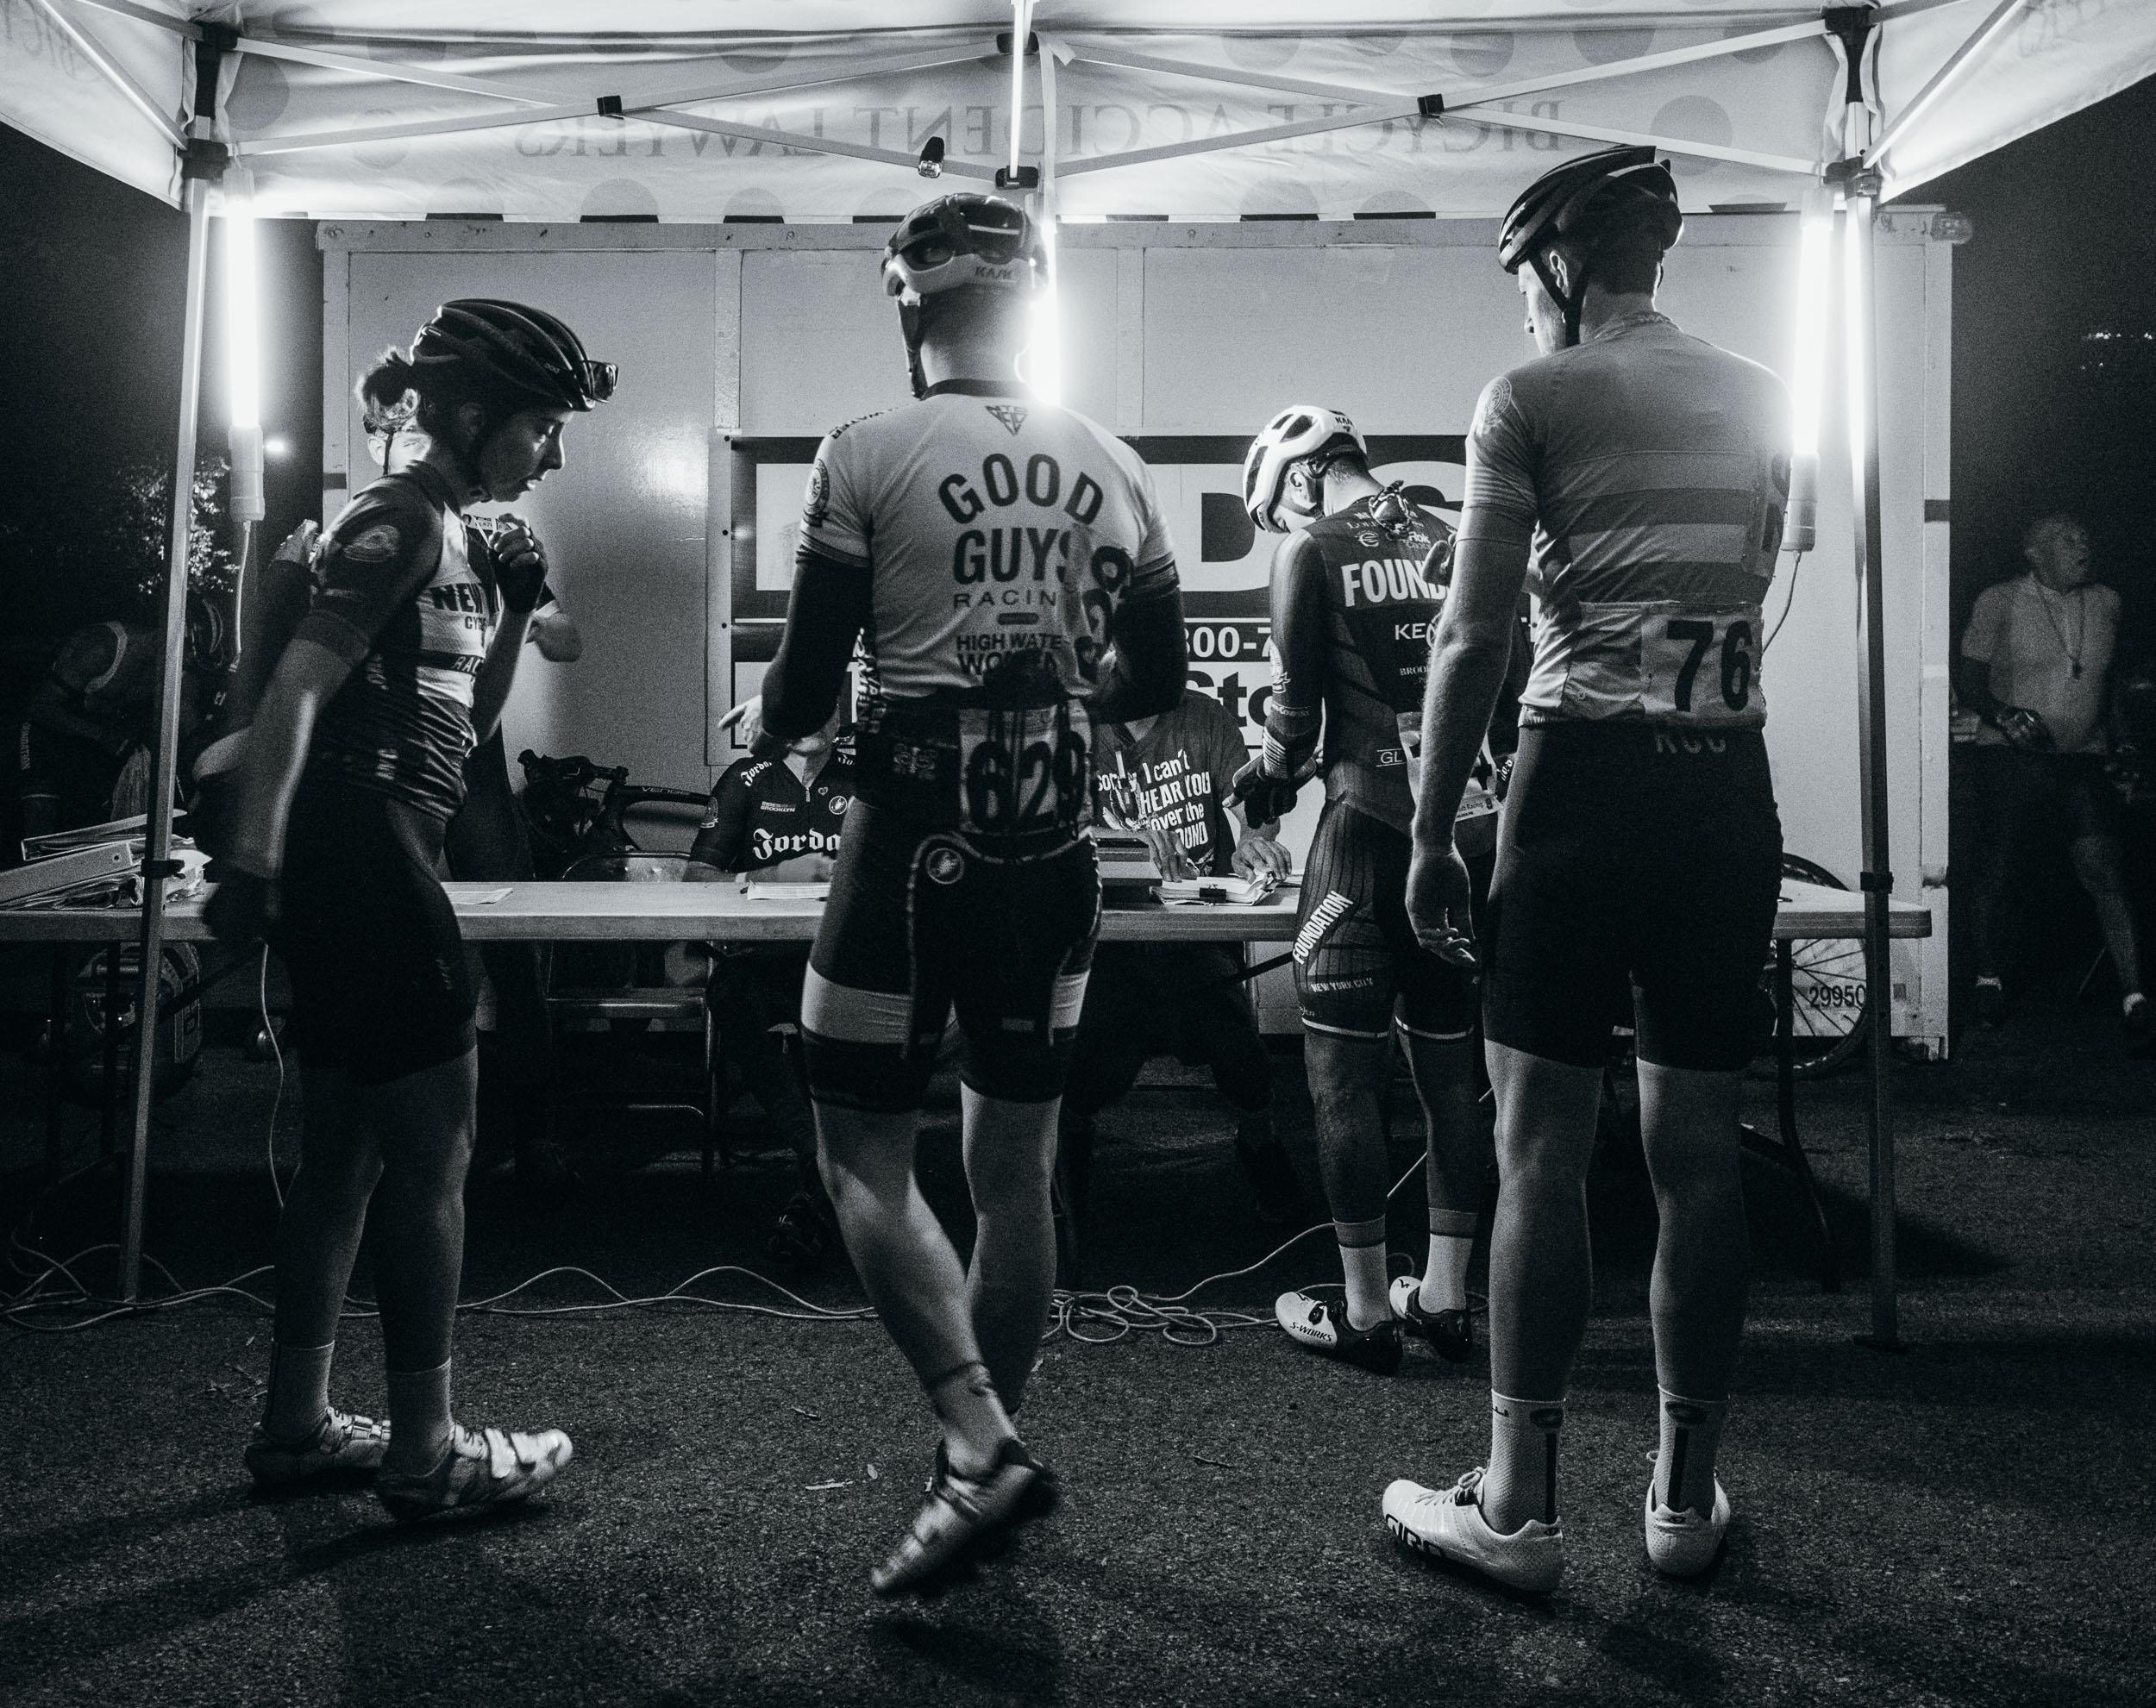 photo-rhetoric-to-be-determined-crca-club-race-101.jpg